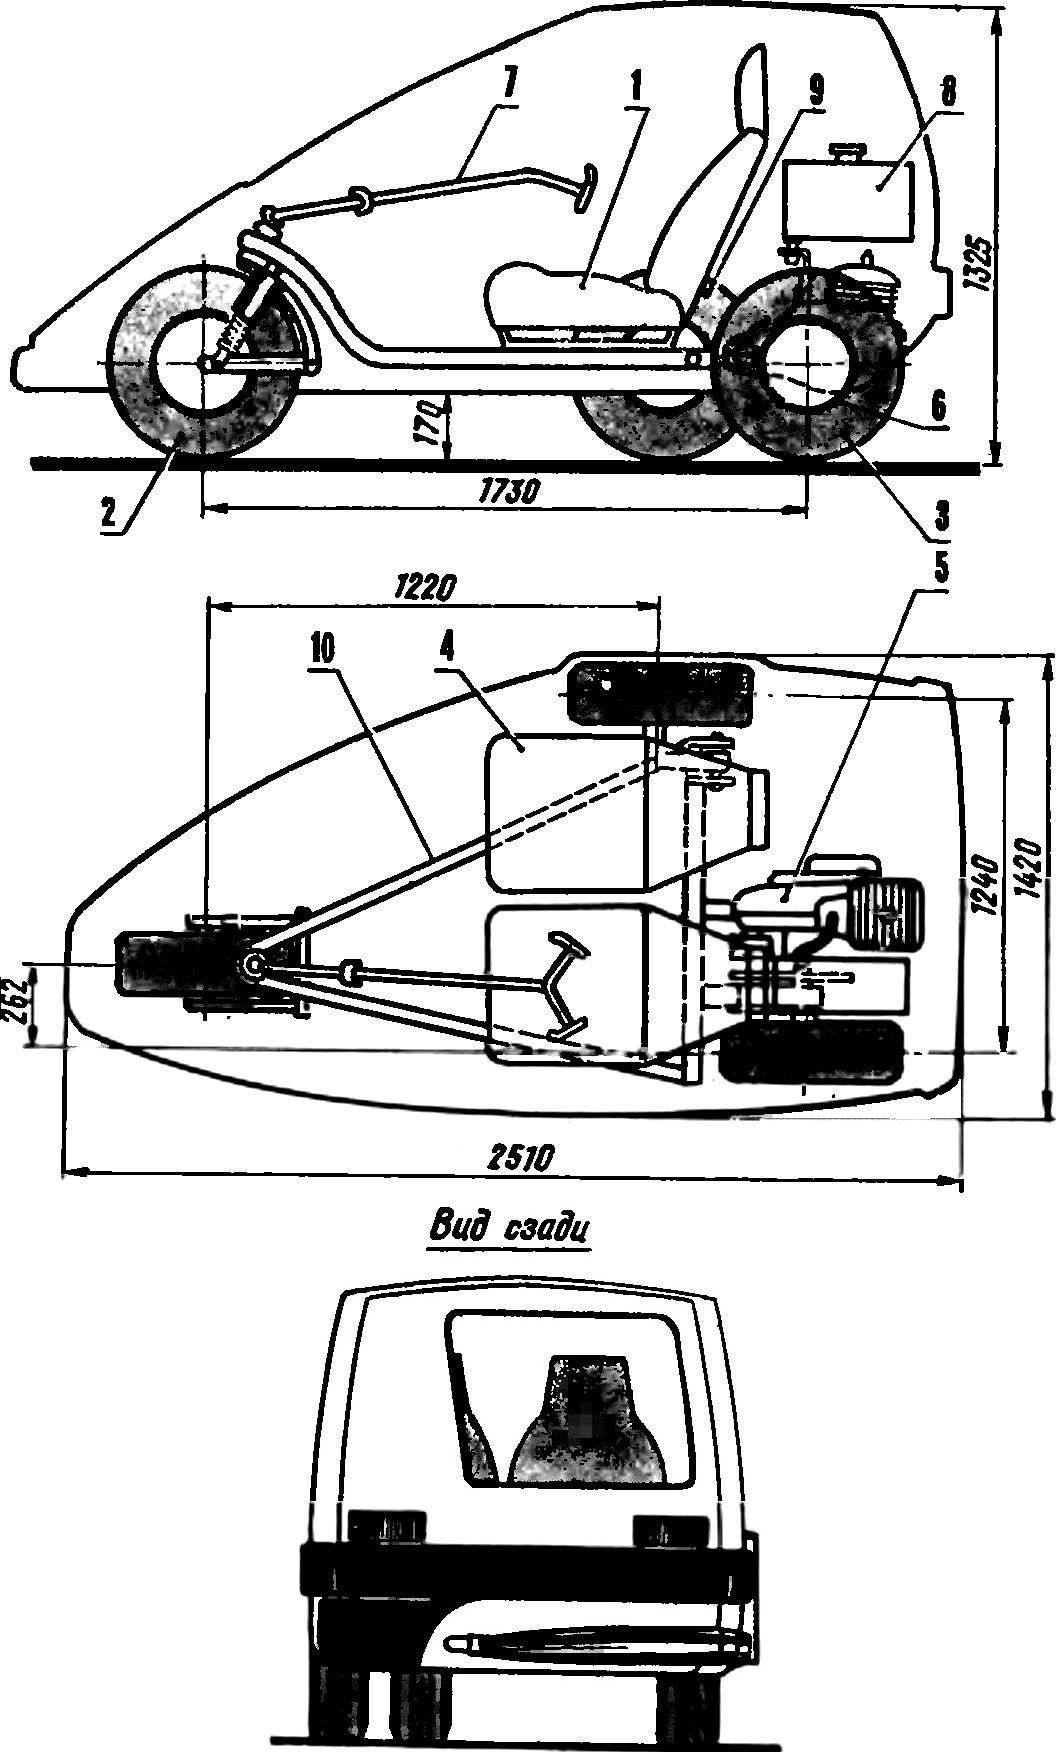 Рис. 1. Компоновка мотомобиля «Векша».